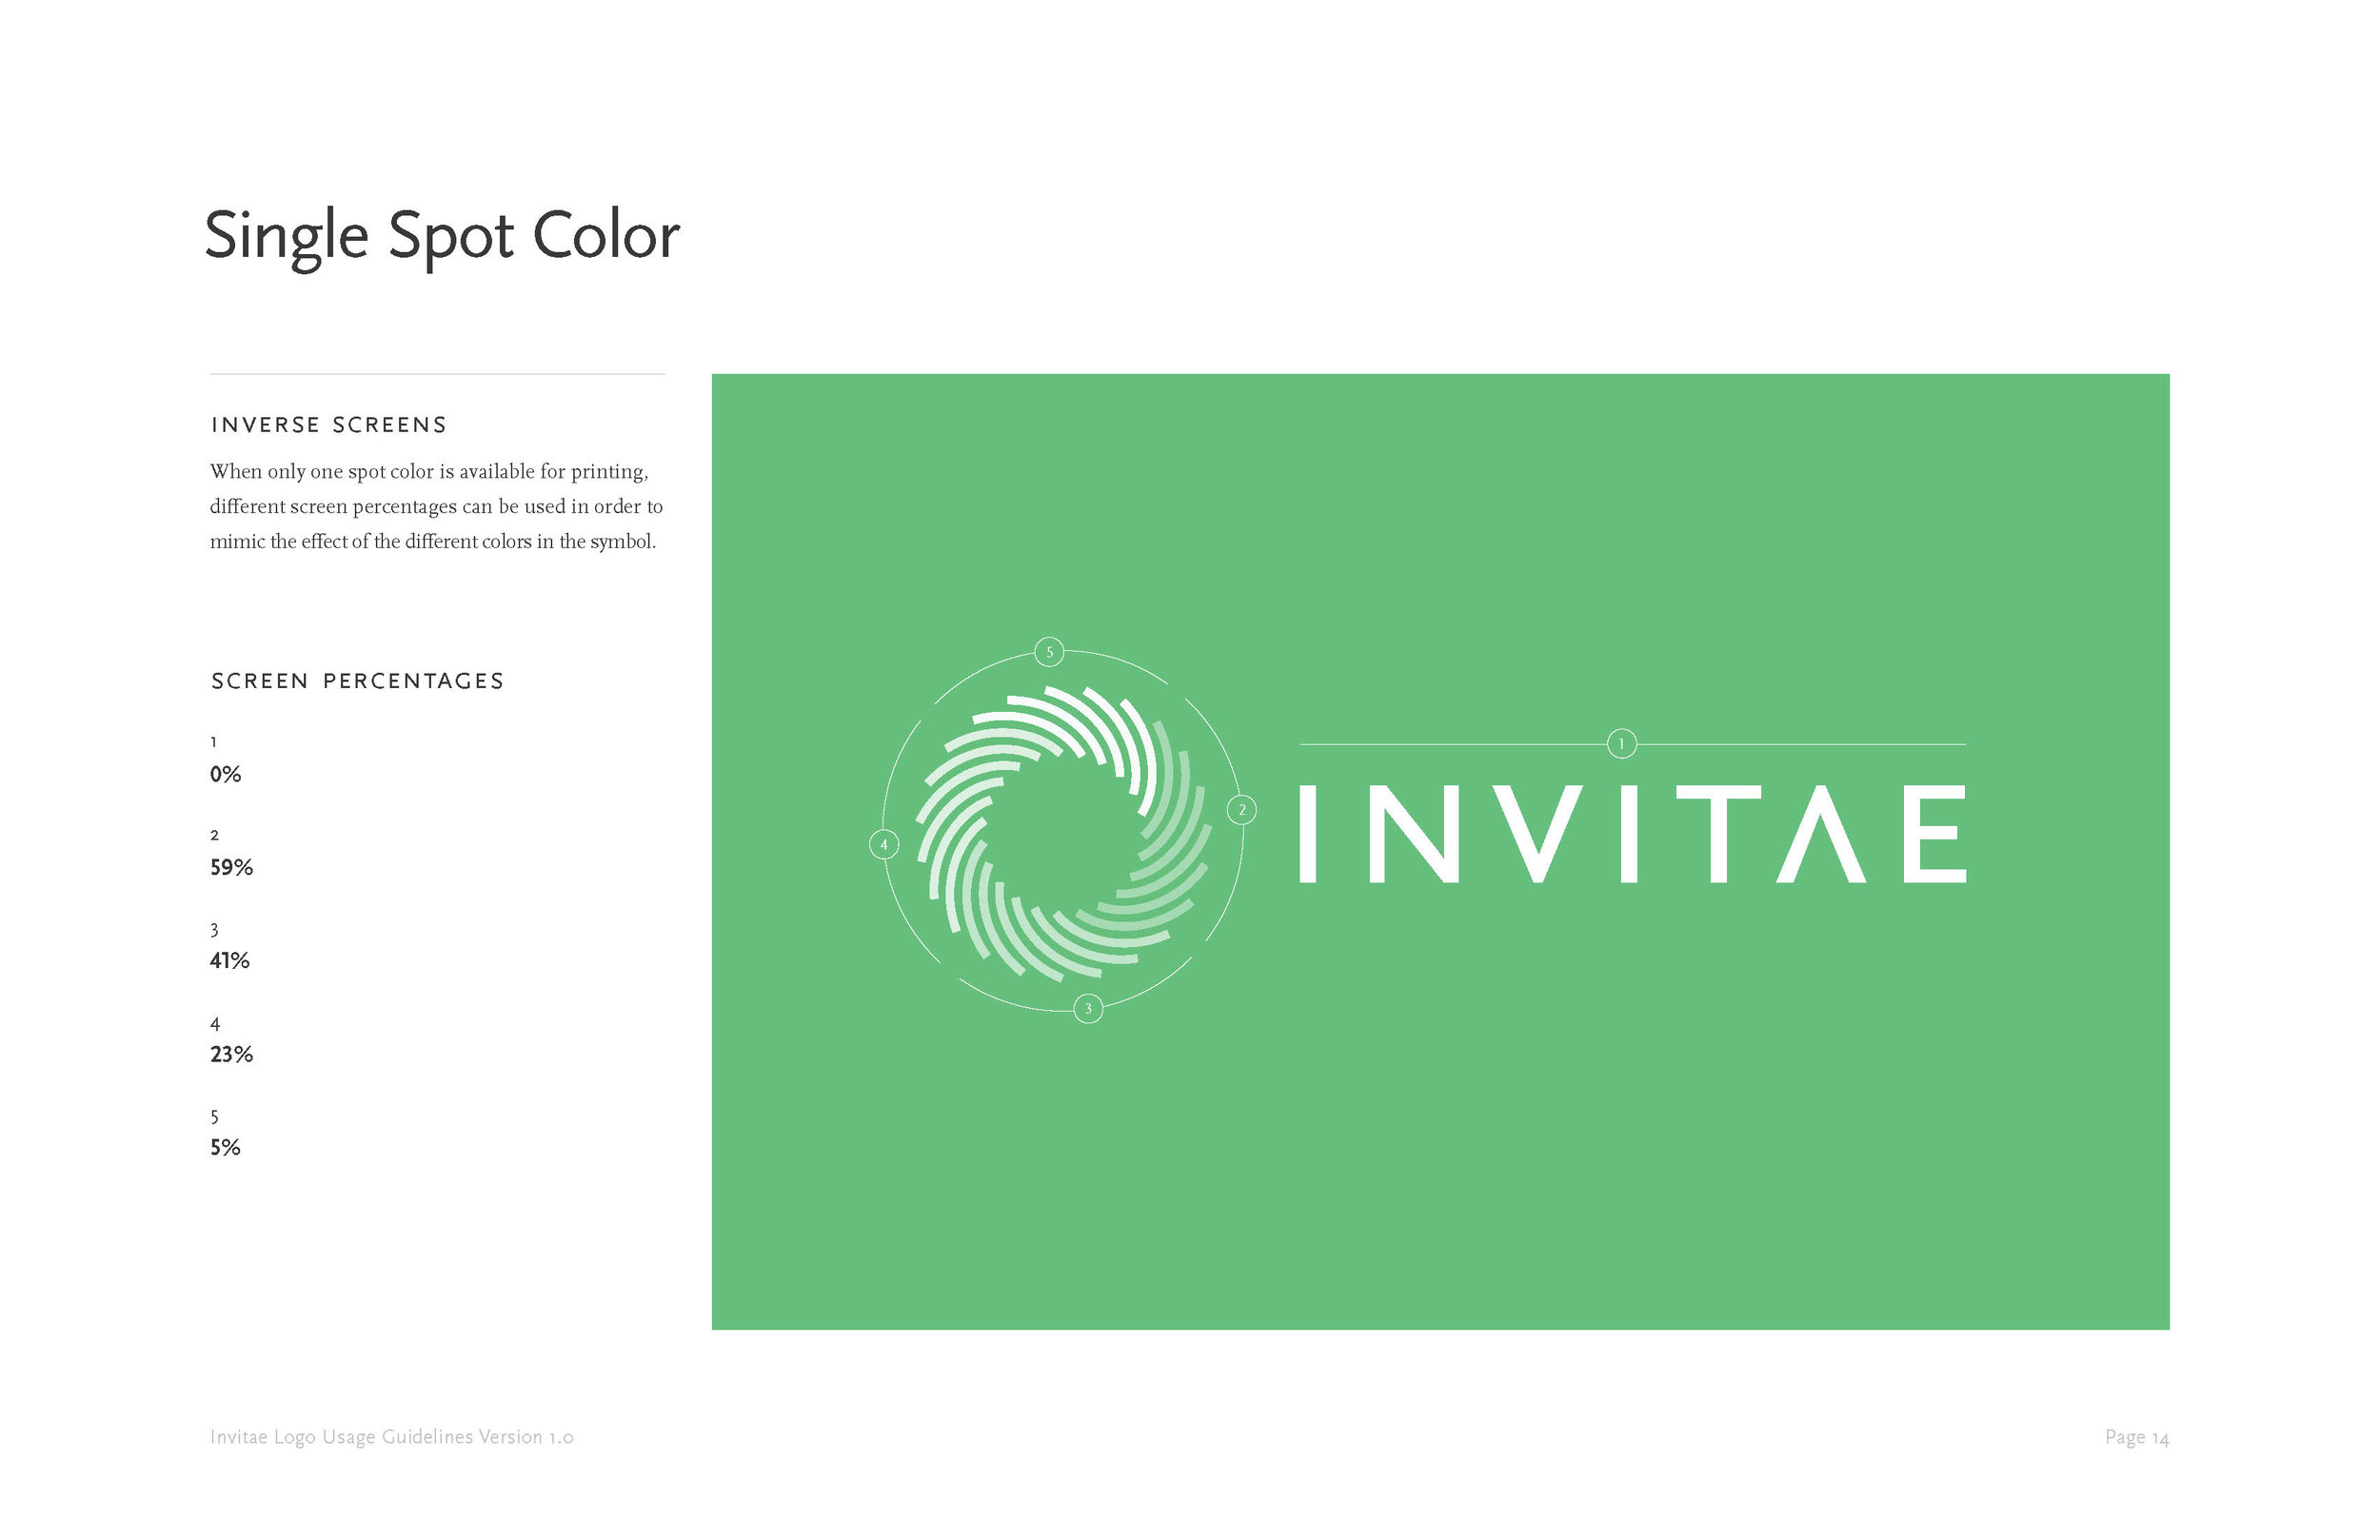 Invitae_logo_guidelines_Page_16.jpg